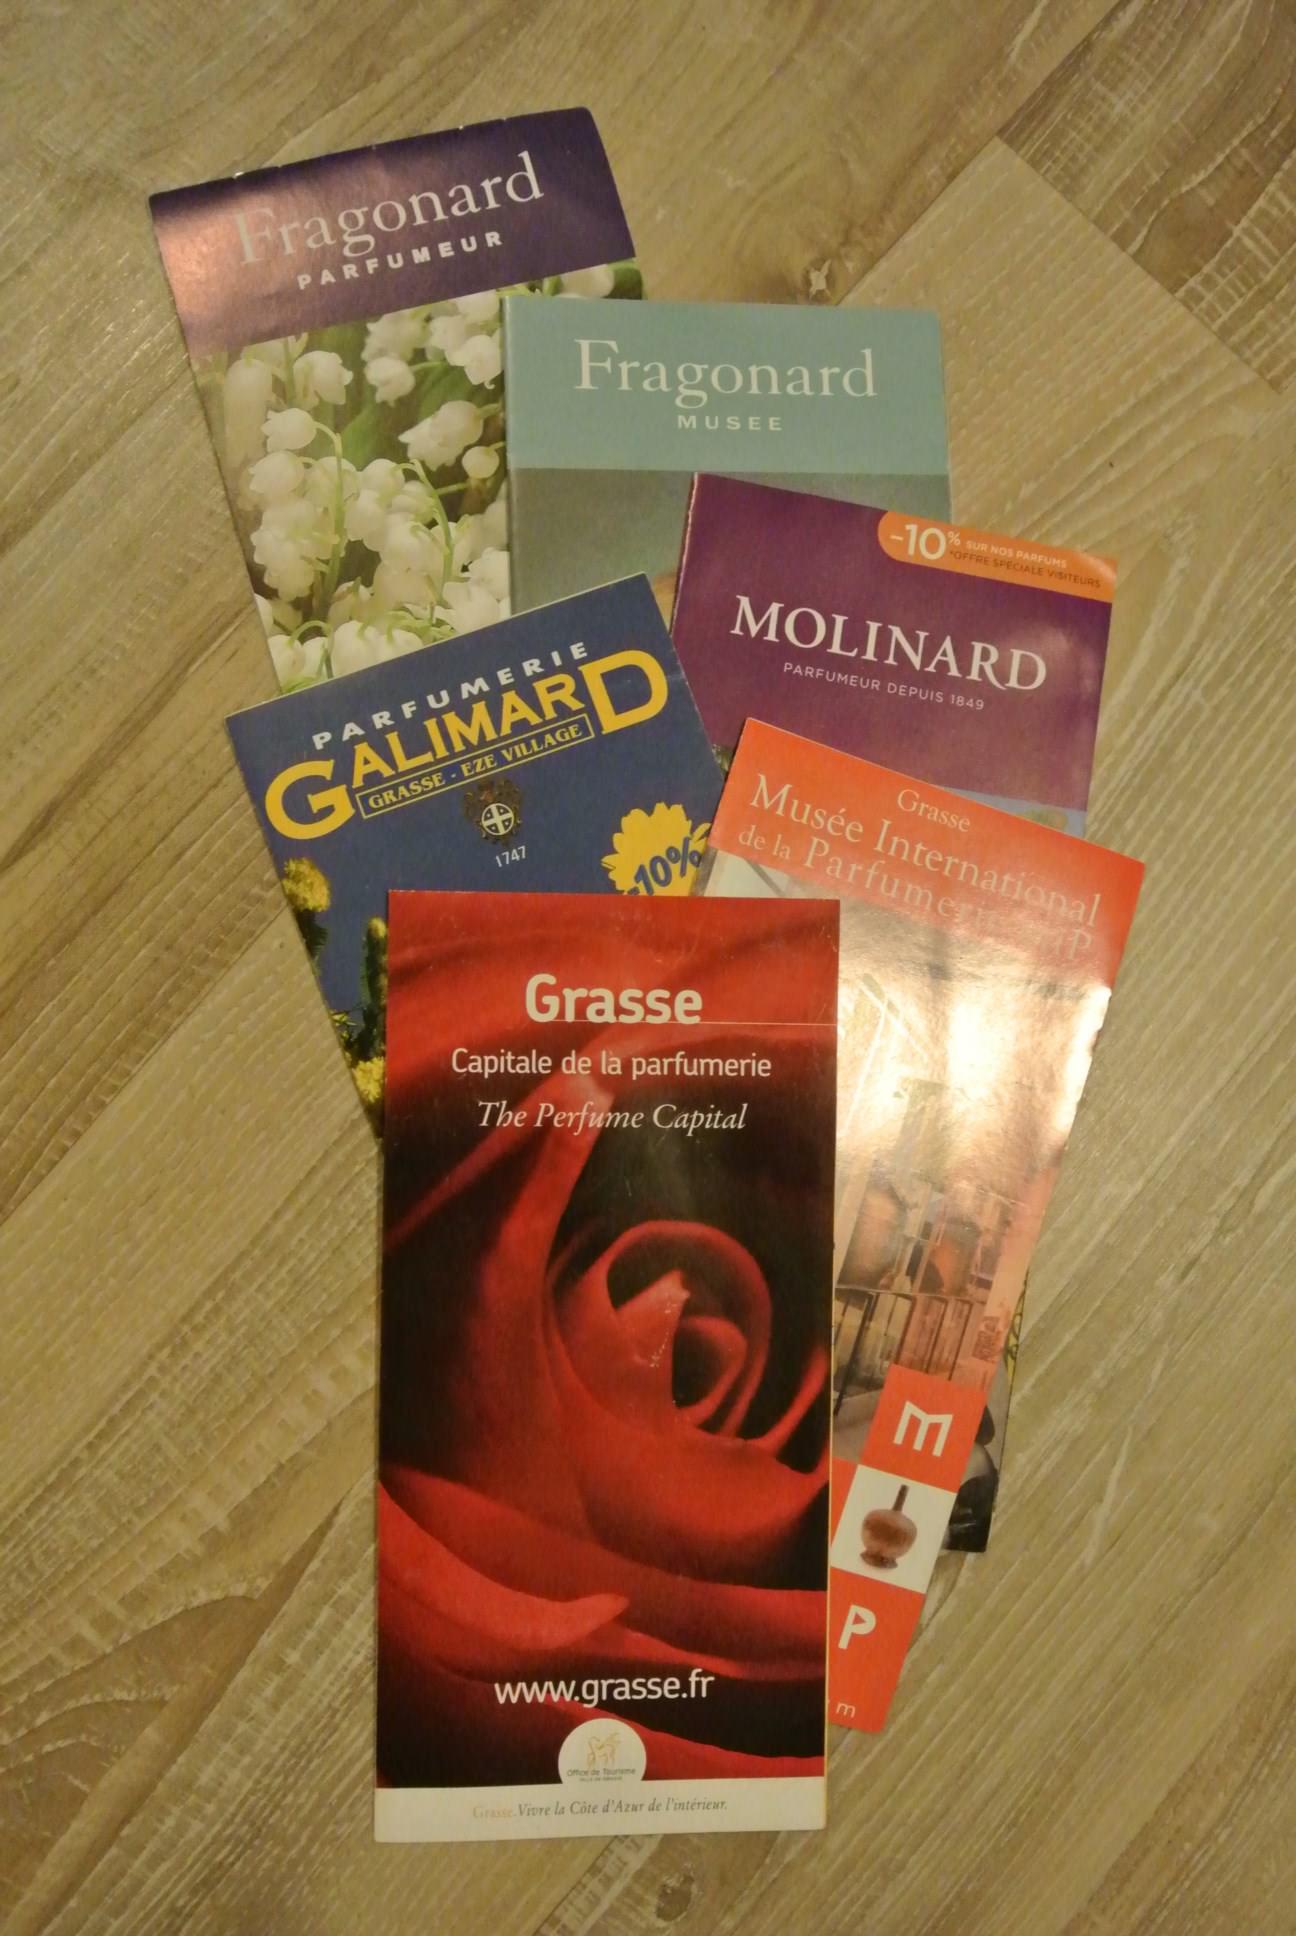 Galimard, Molinard, Fragonard?